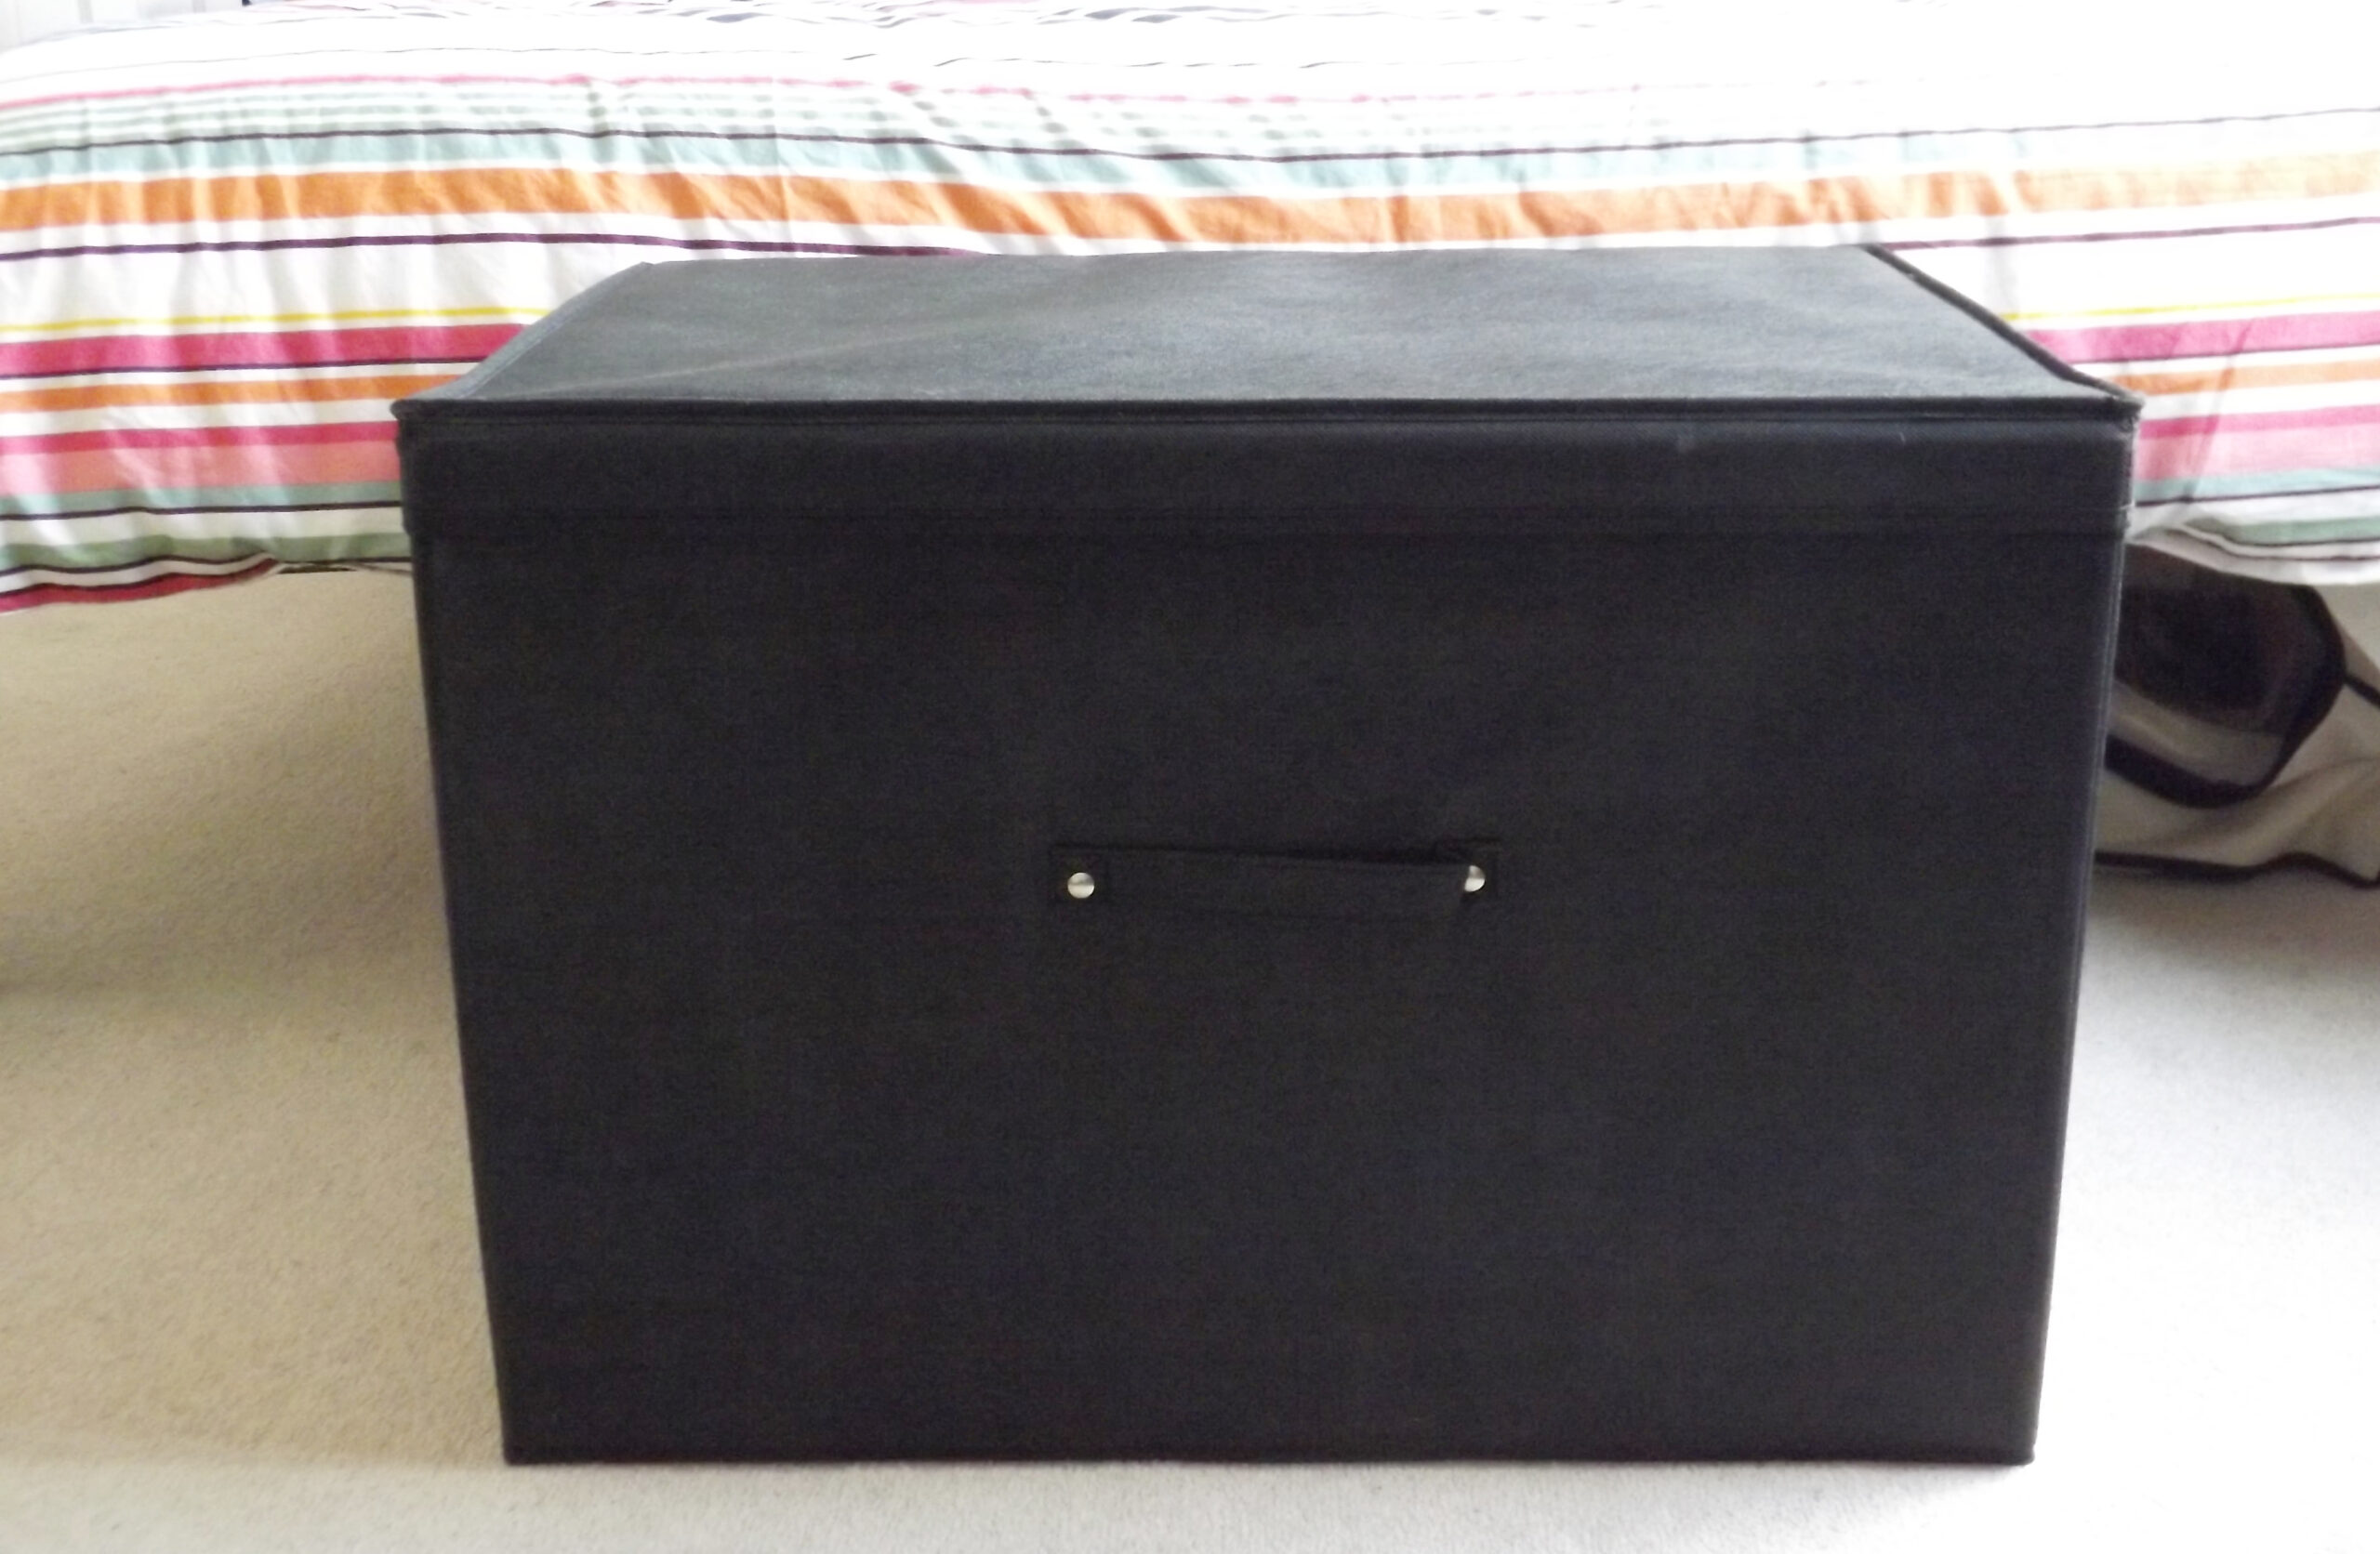 Super Jumbo Foldable Box With Lid, Heavy Duty, 100 Litre Capacity, 60x45x40cm, Black